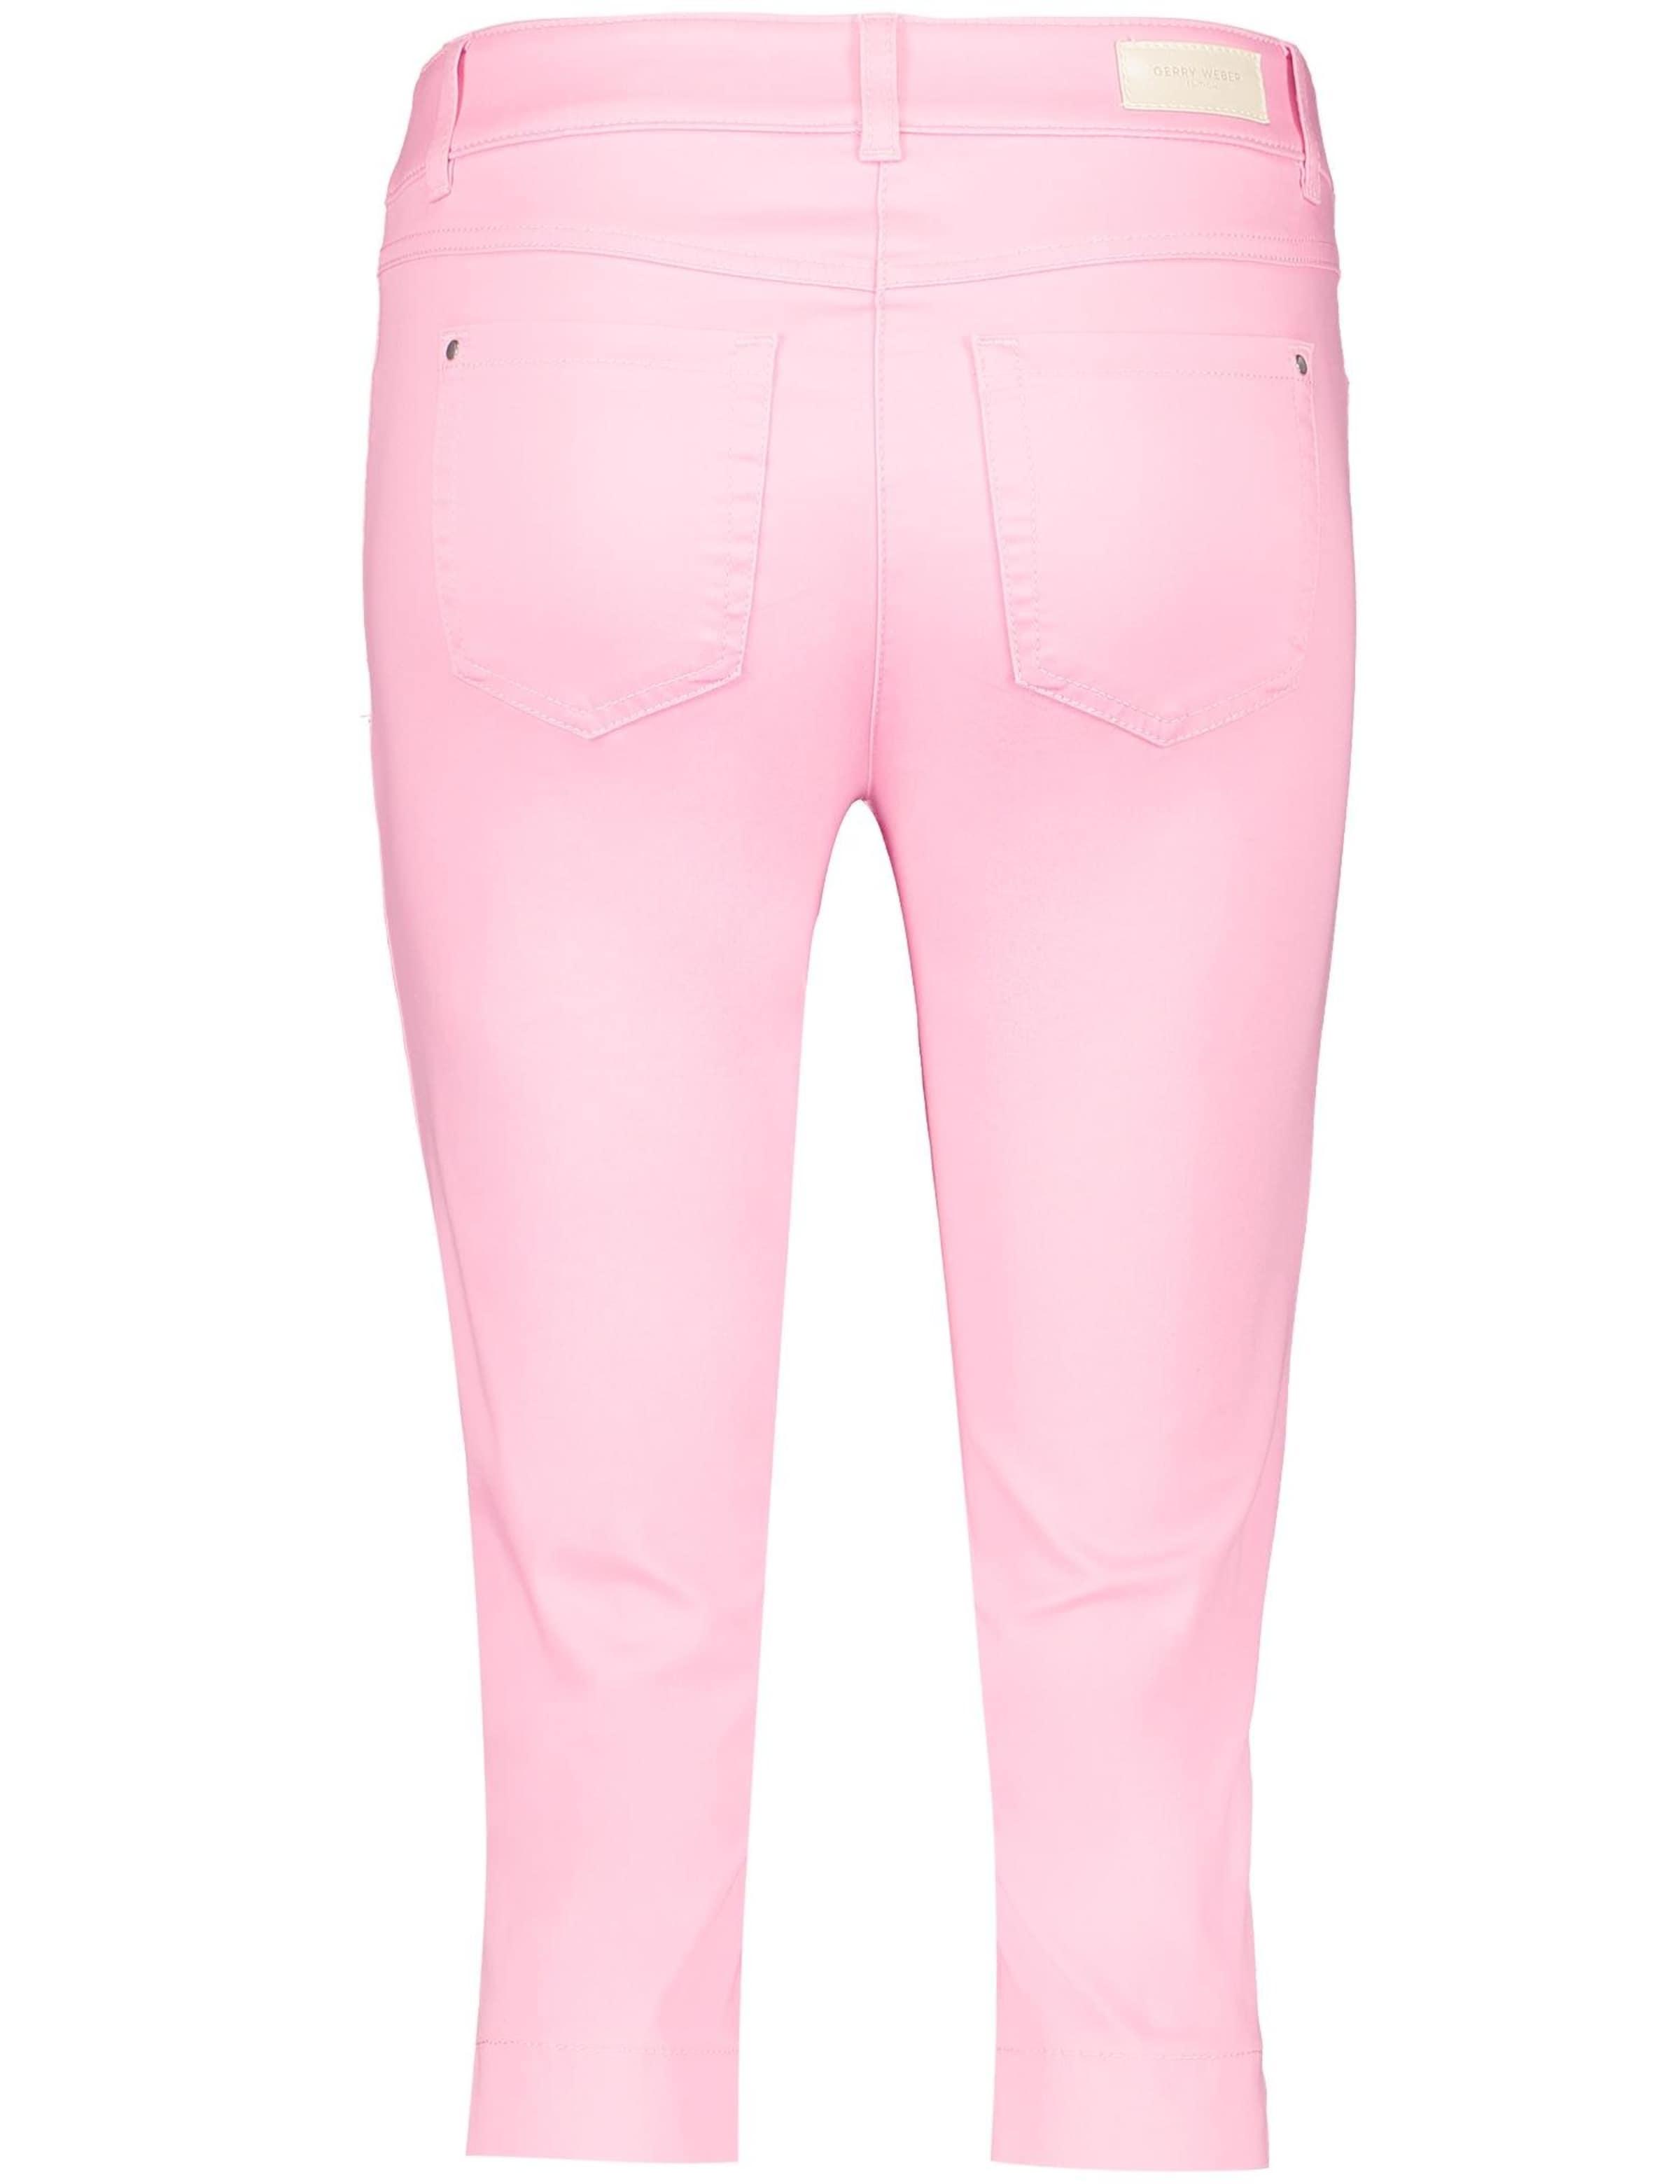 Weber Weber Hose Pink In Pink Gerry Gerry In Hose N0ym8nwPvO